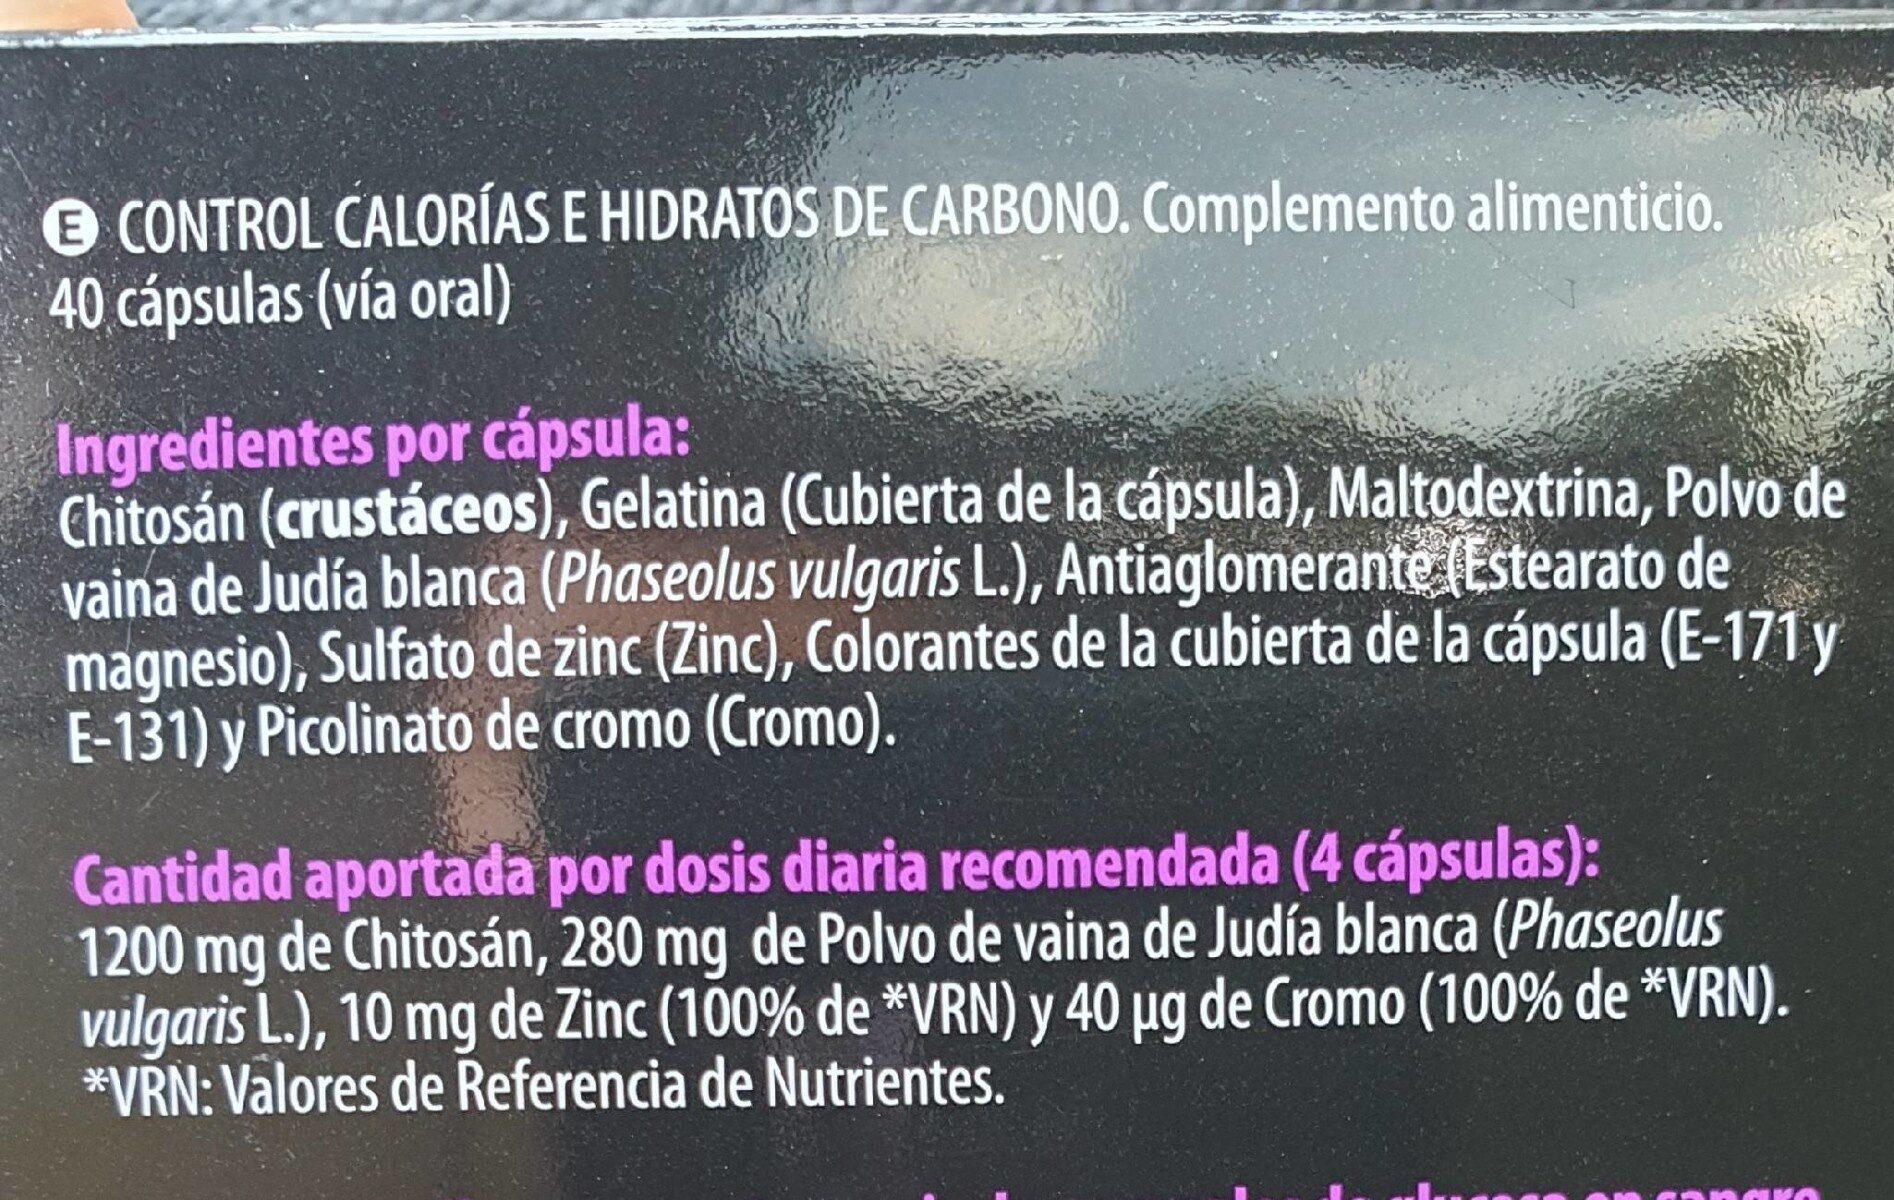 Control calorias - Nährwertangaben - es